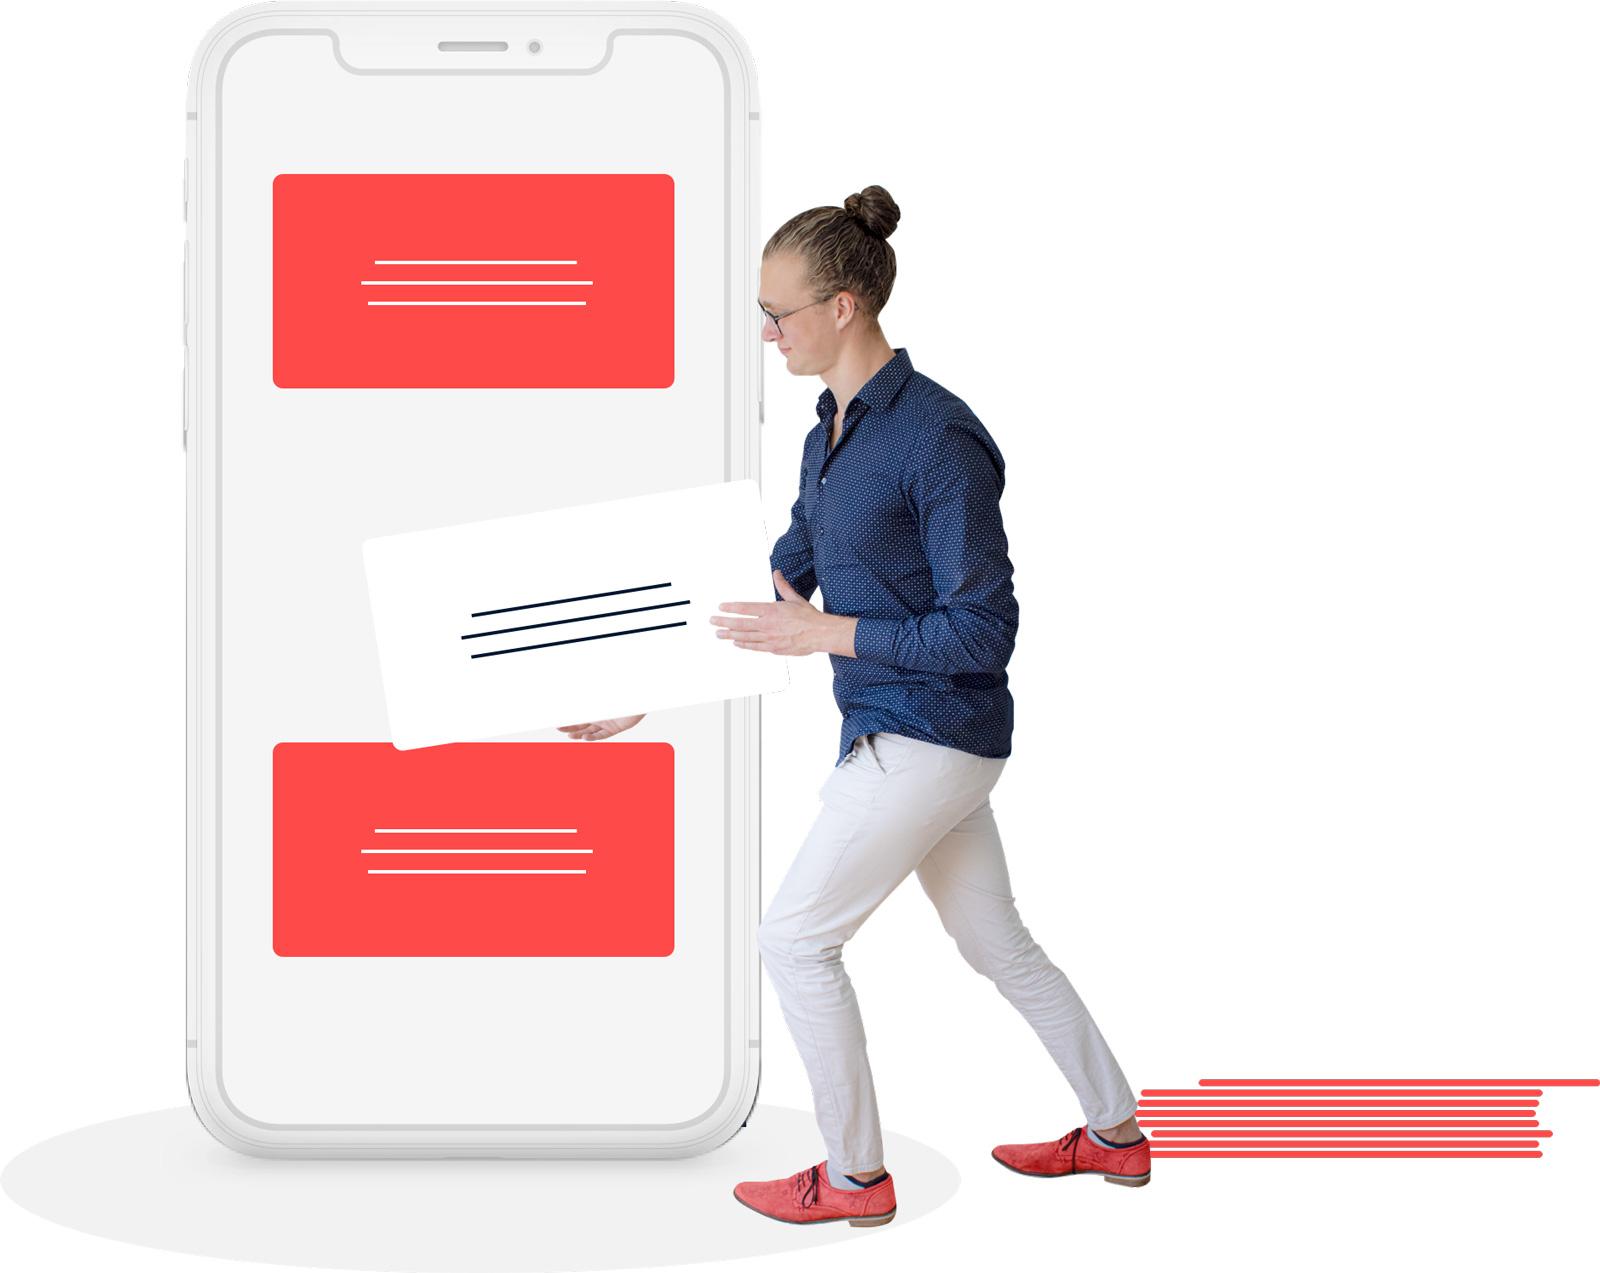 webdesign   Pixel Like